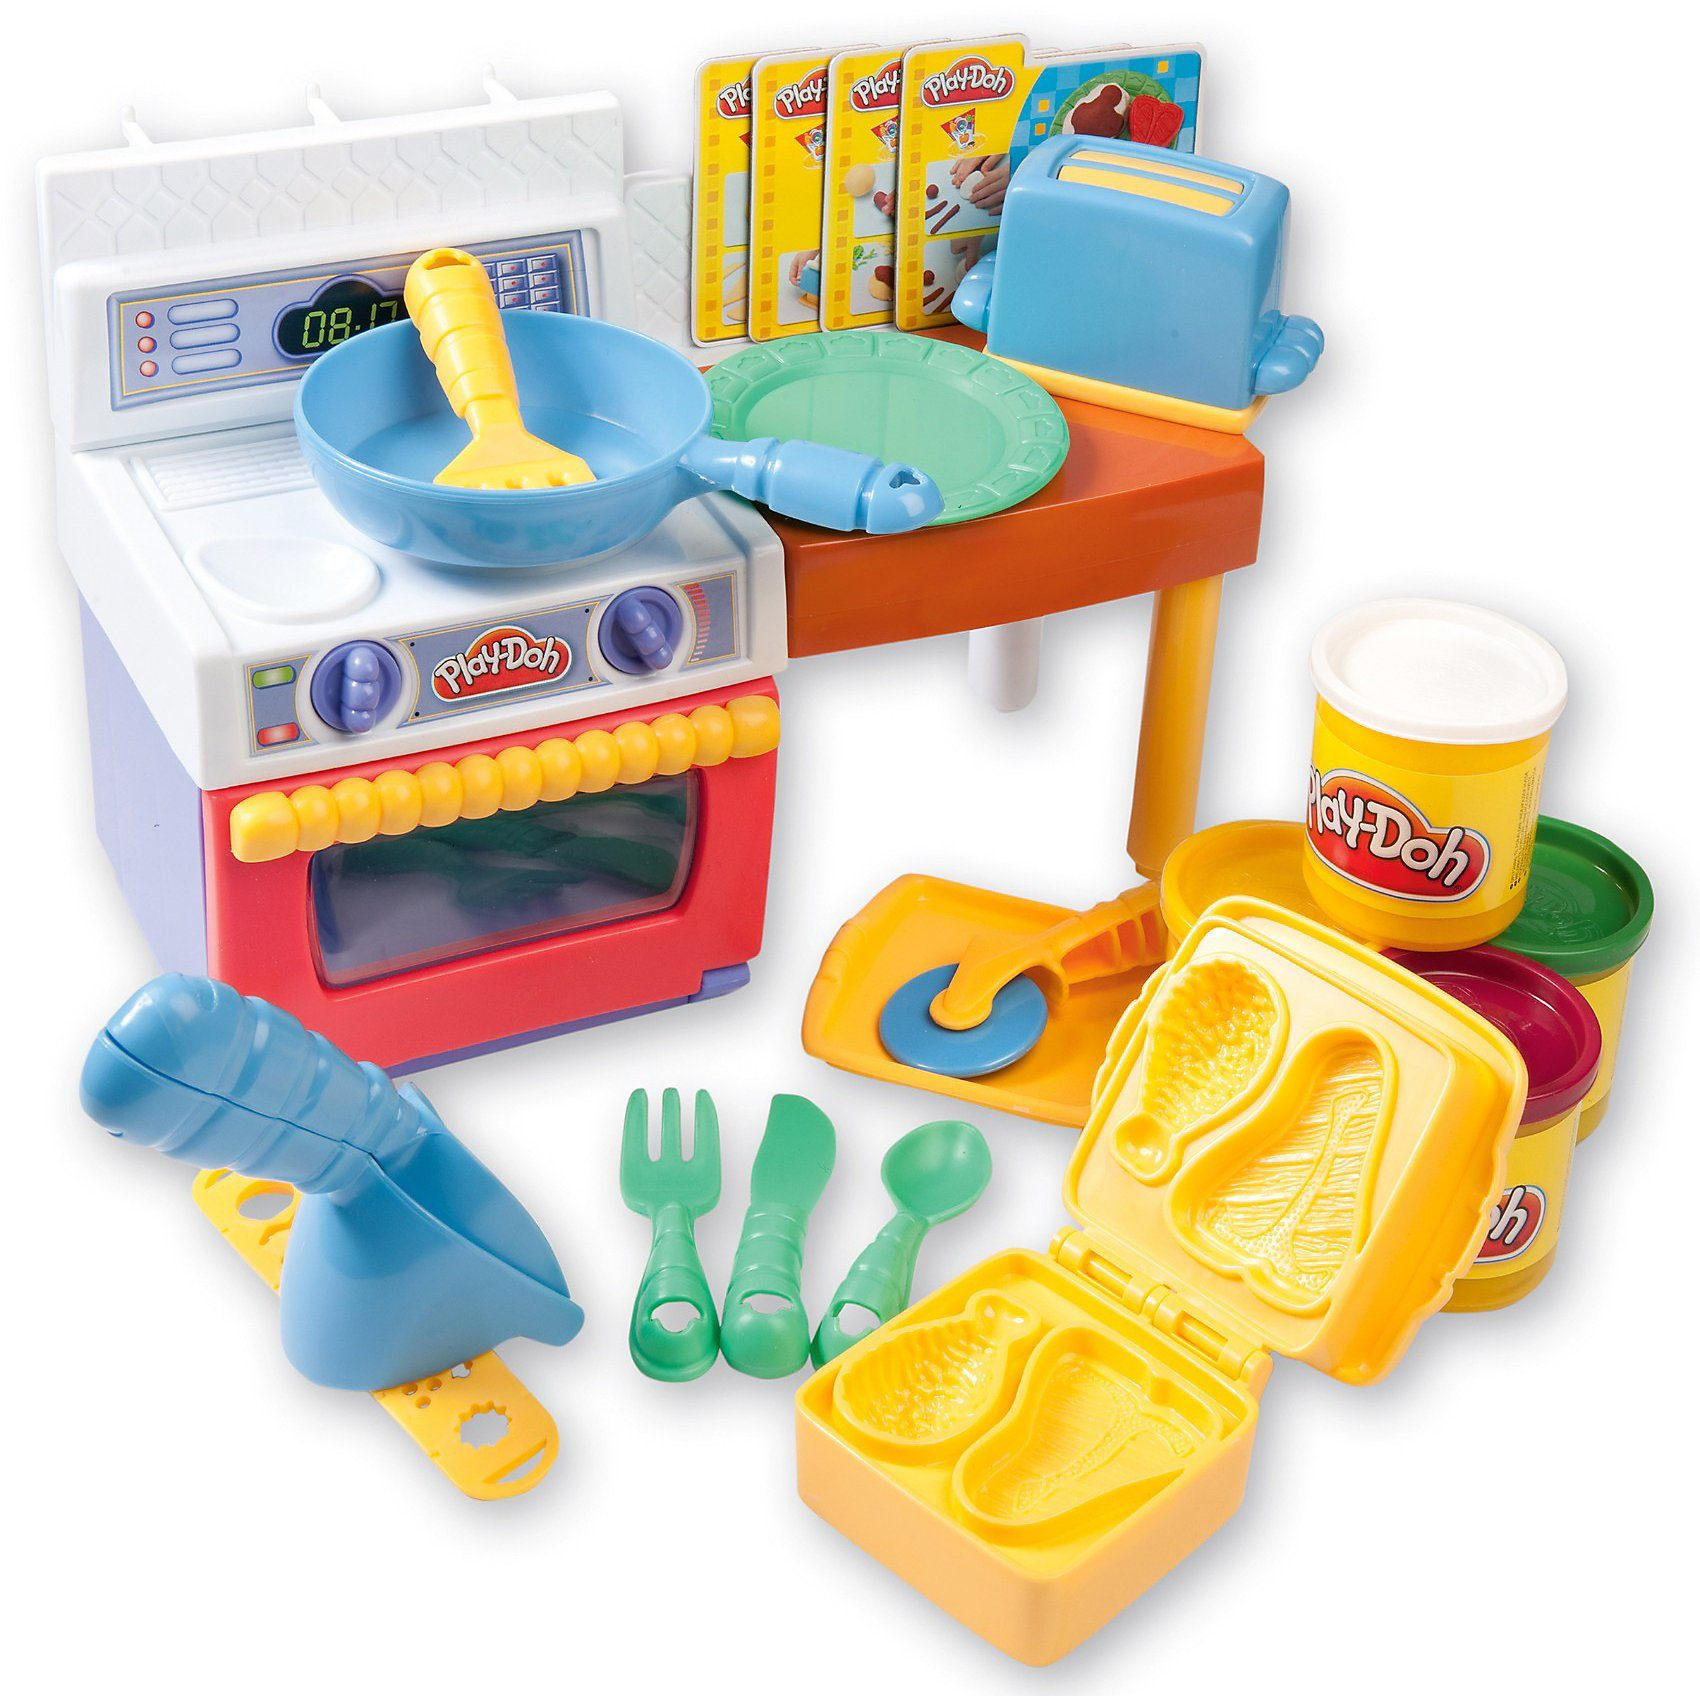 Hasbro Play-Doh - Knetküche